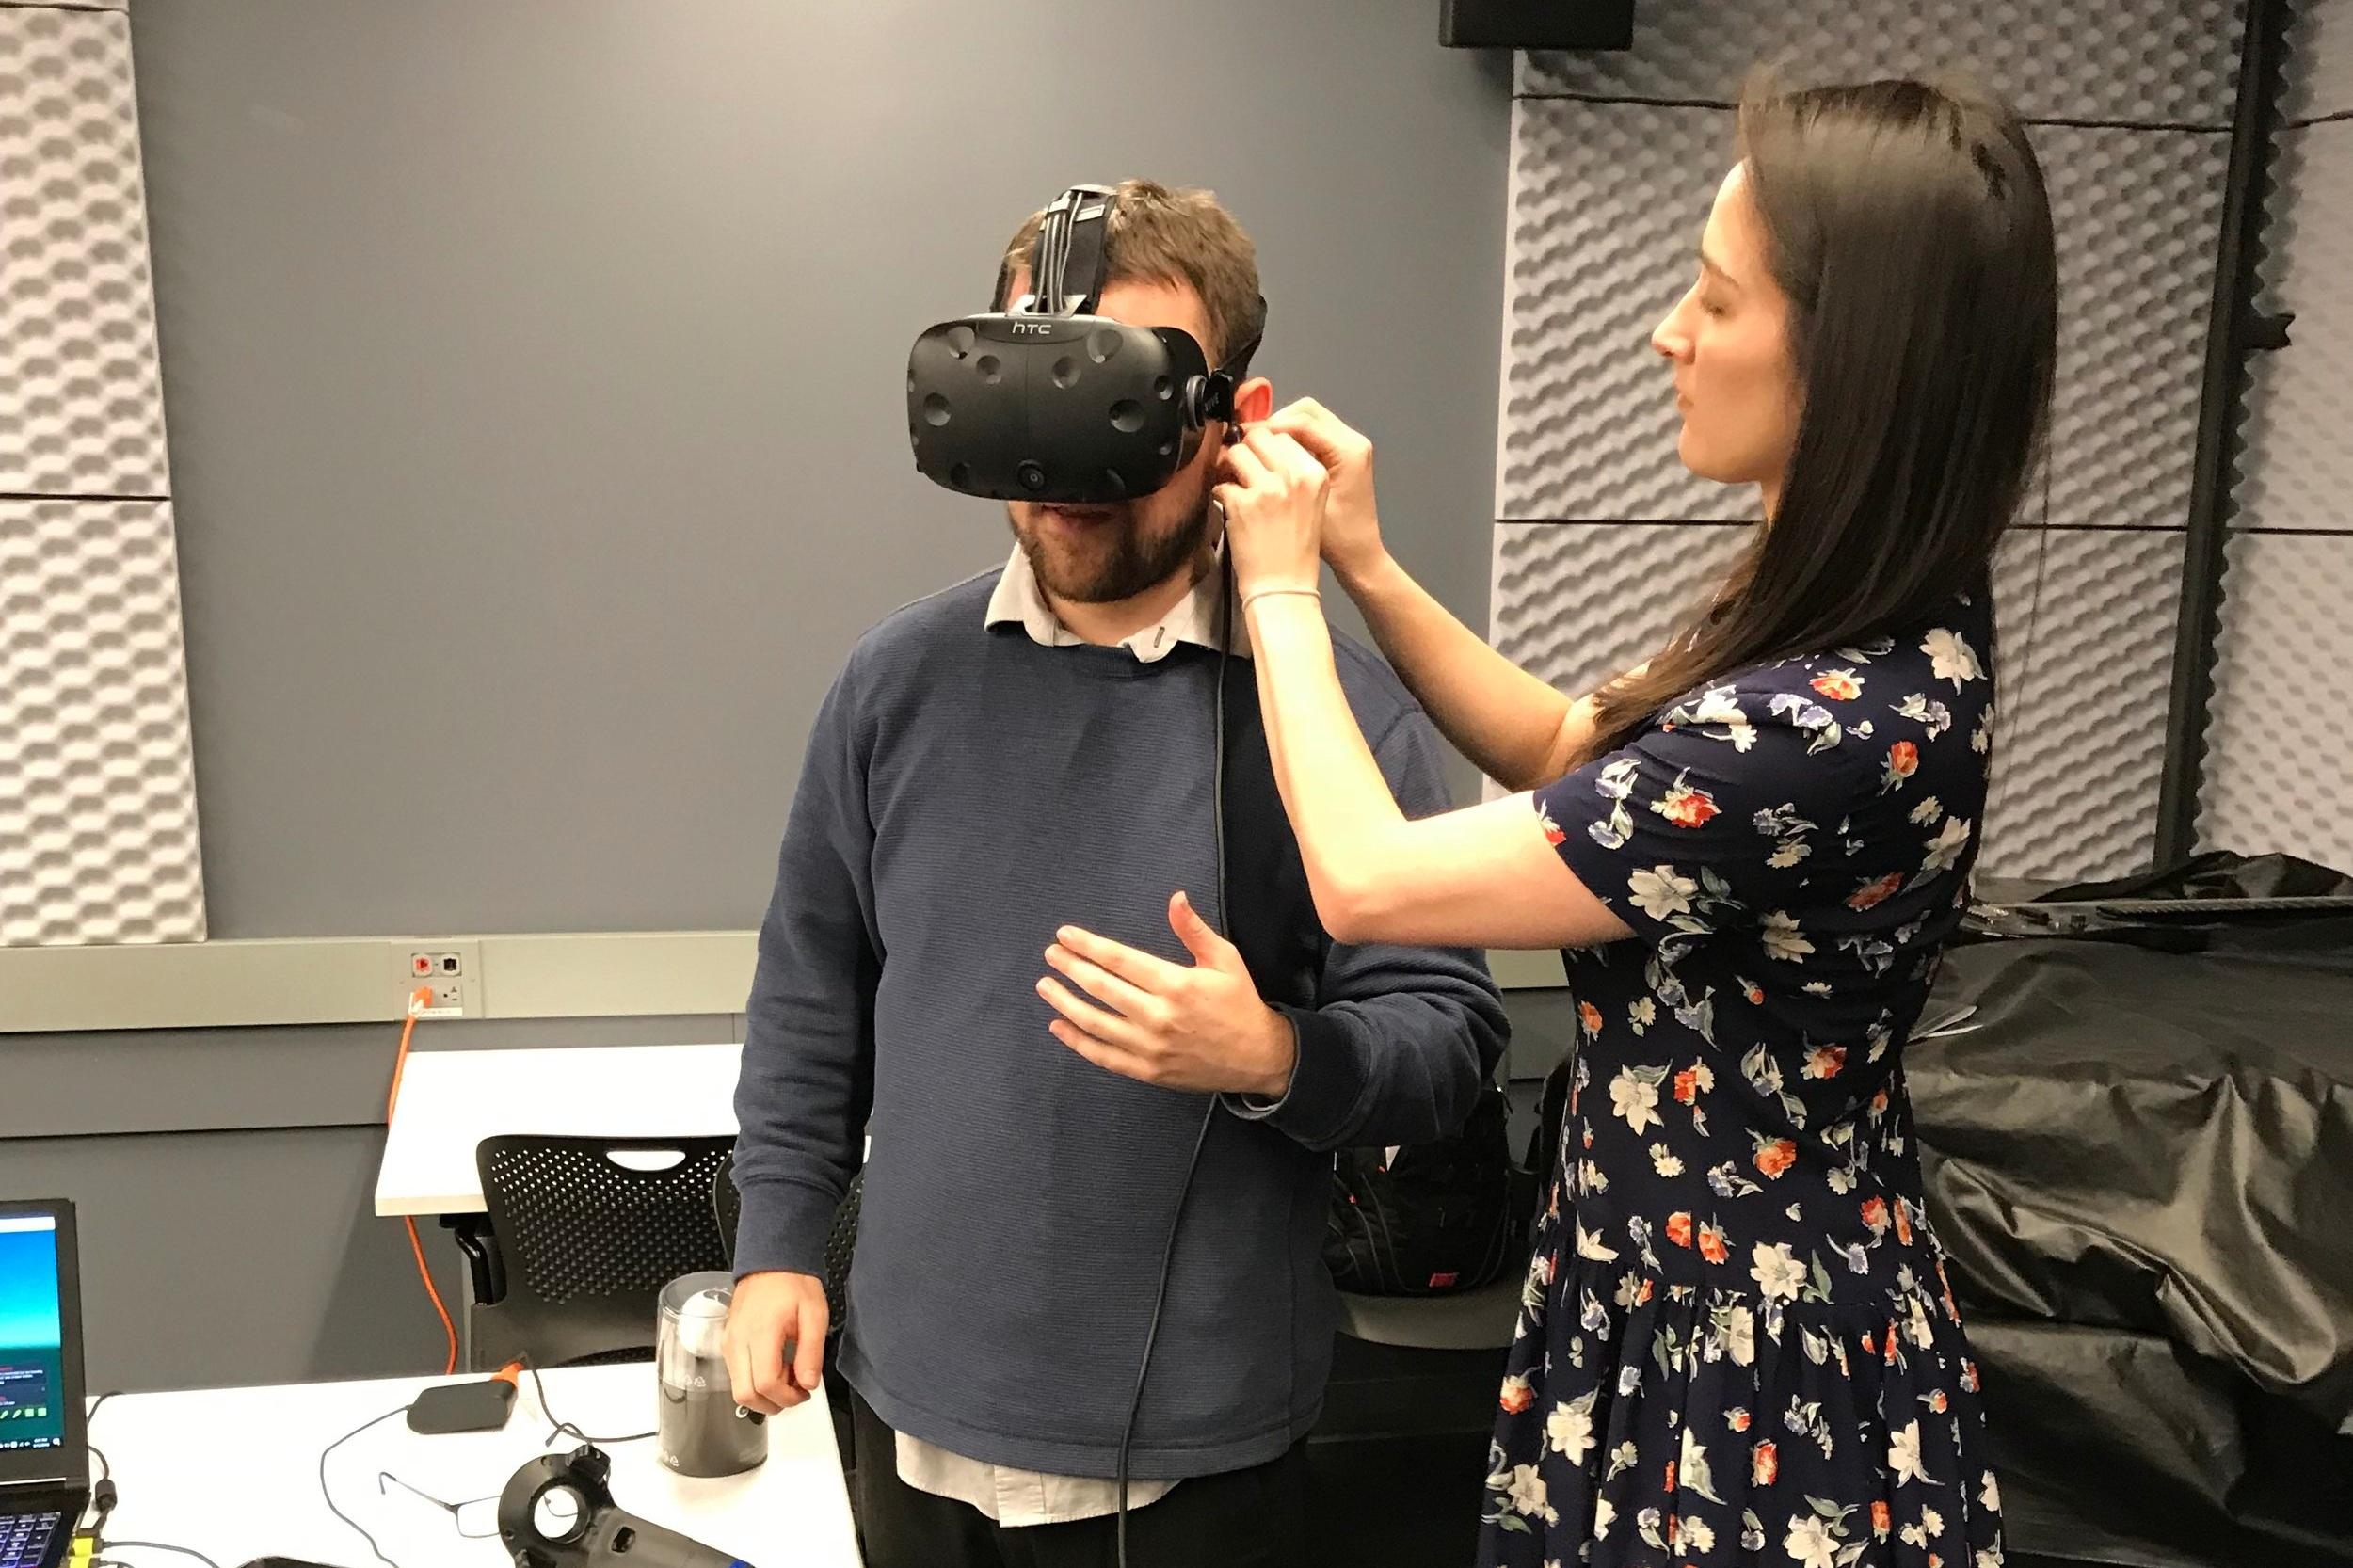 Alice Fromwalt demoing Street Smarts VR's platform